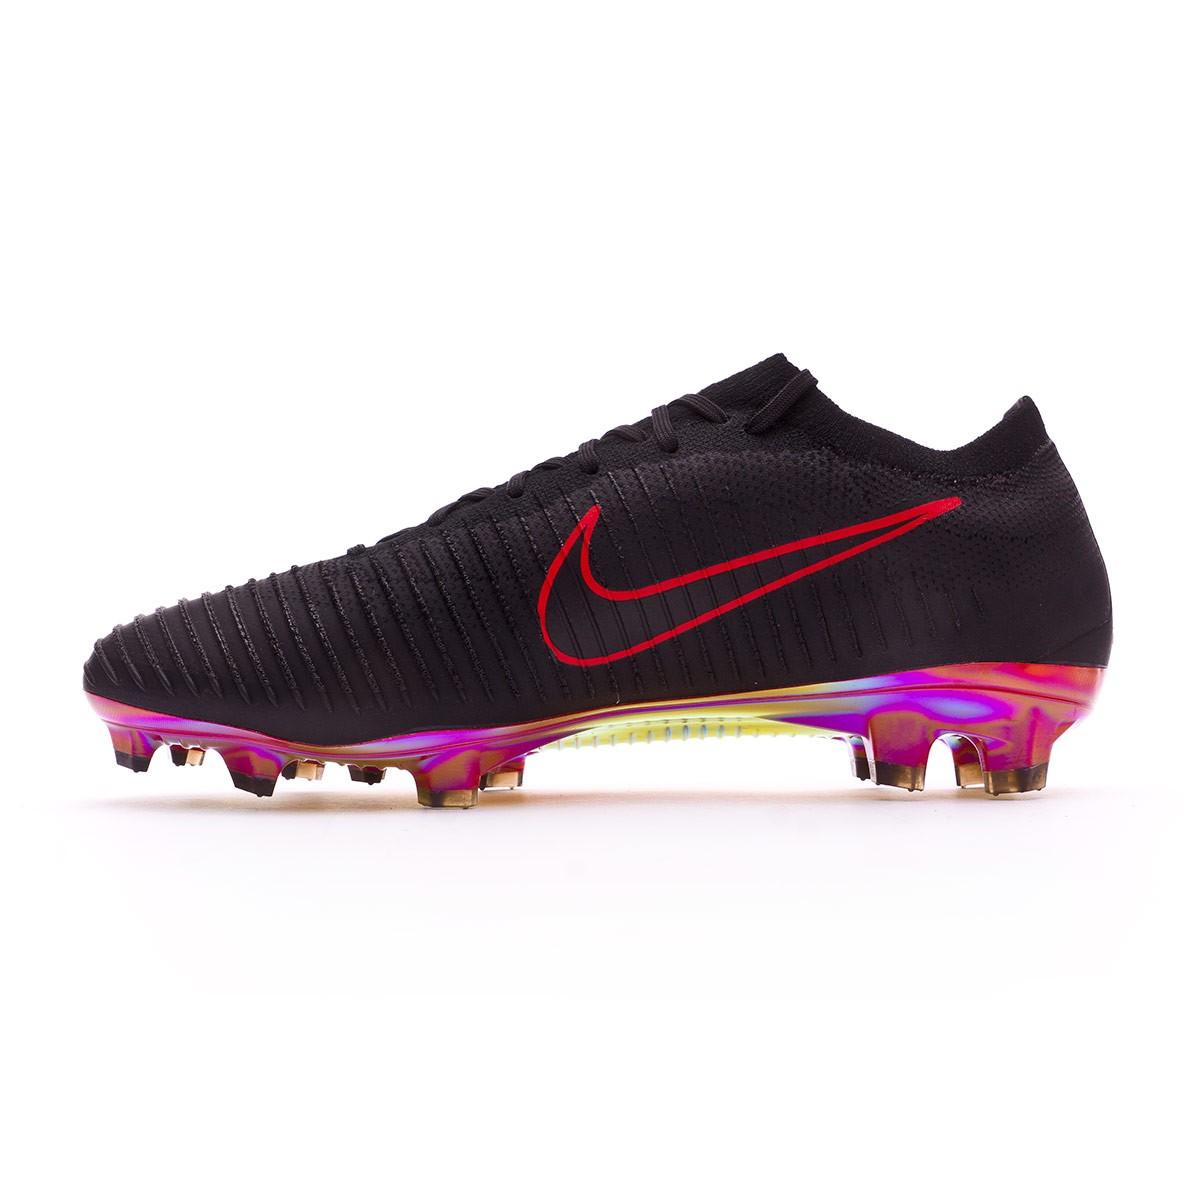 Boot Nike Mercurial Vapor Flyknit Ultra FG Black-University red - Football  store Fútbol Emotion 16ffc45b0